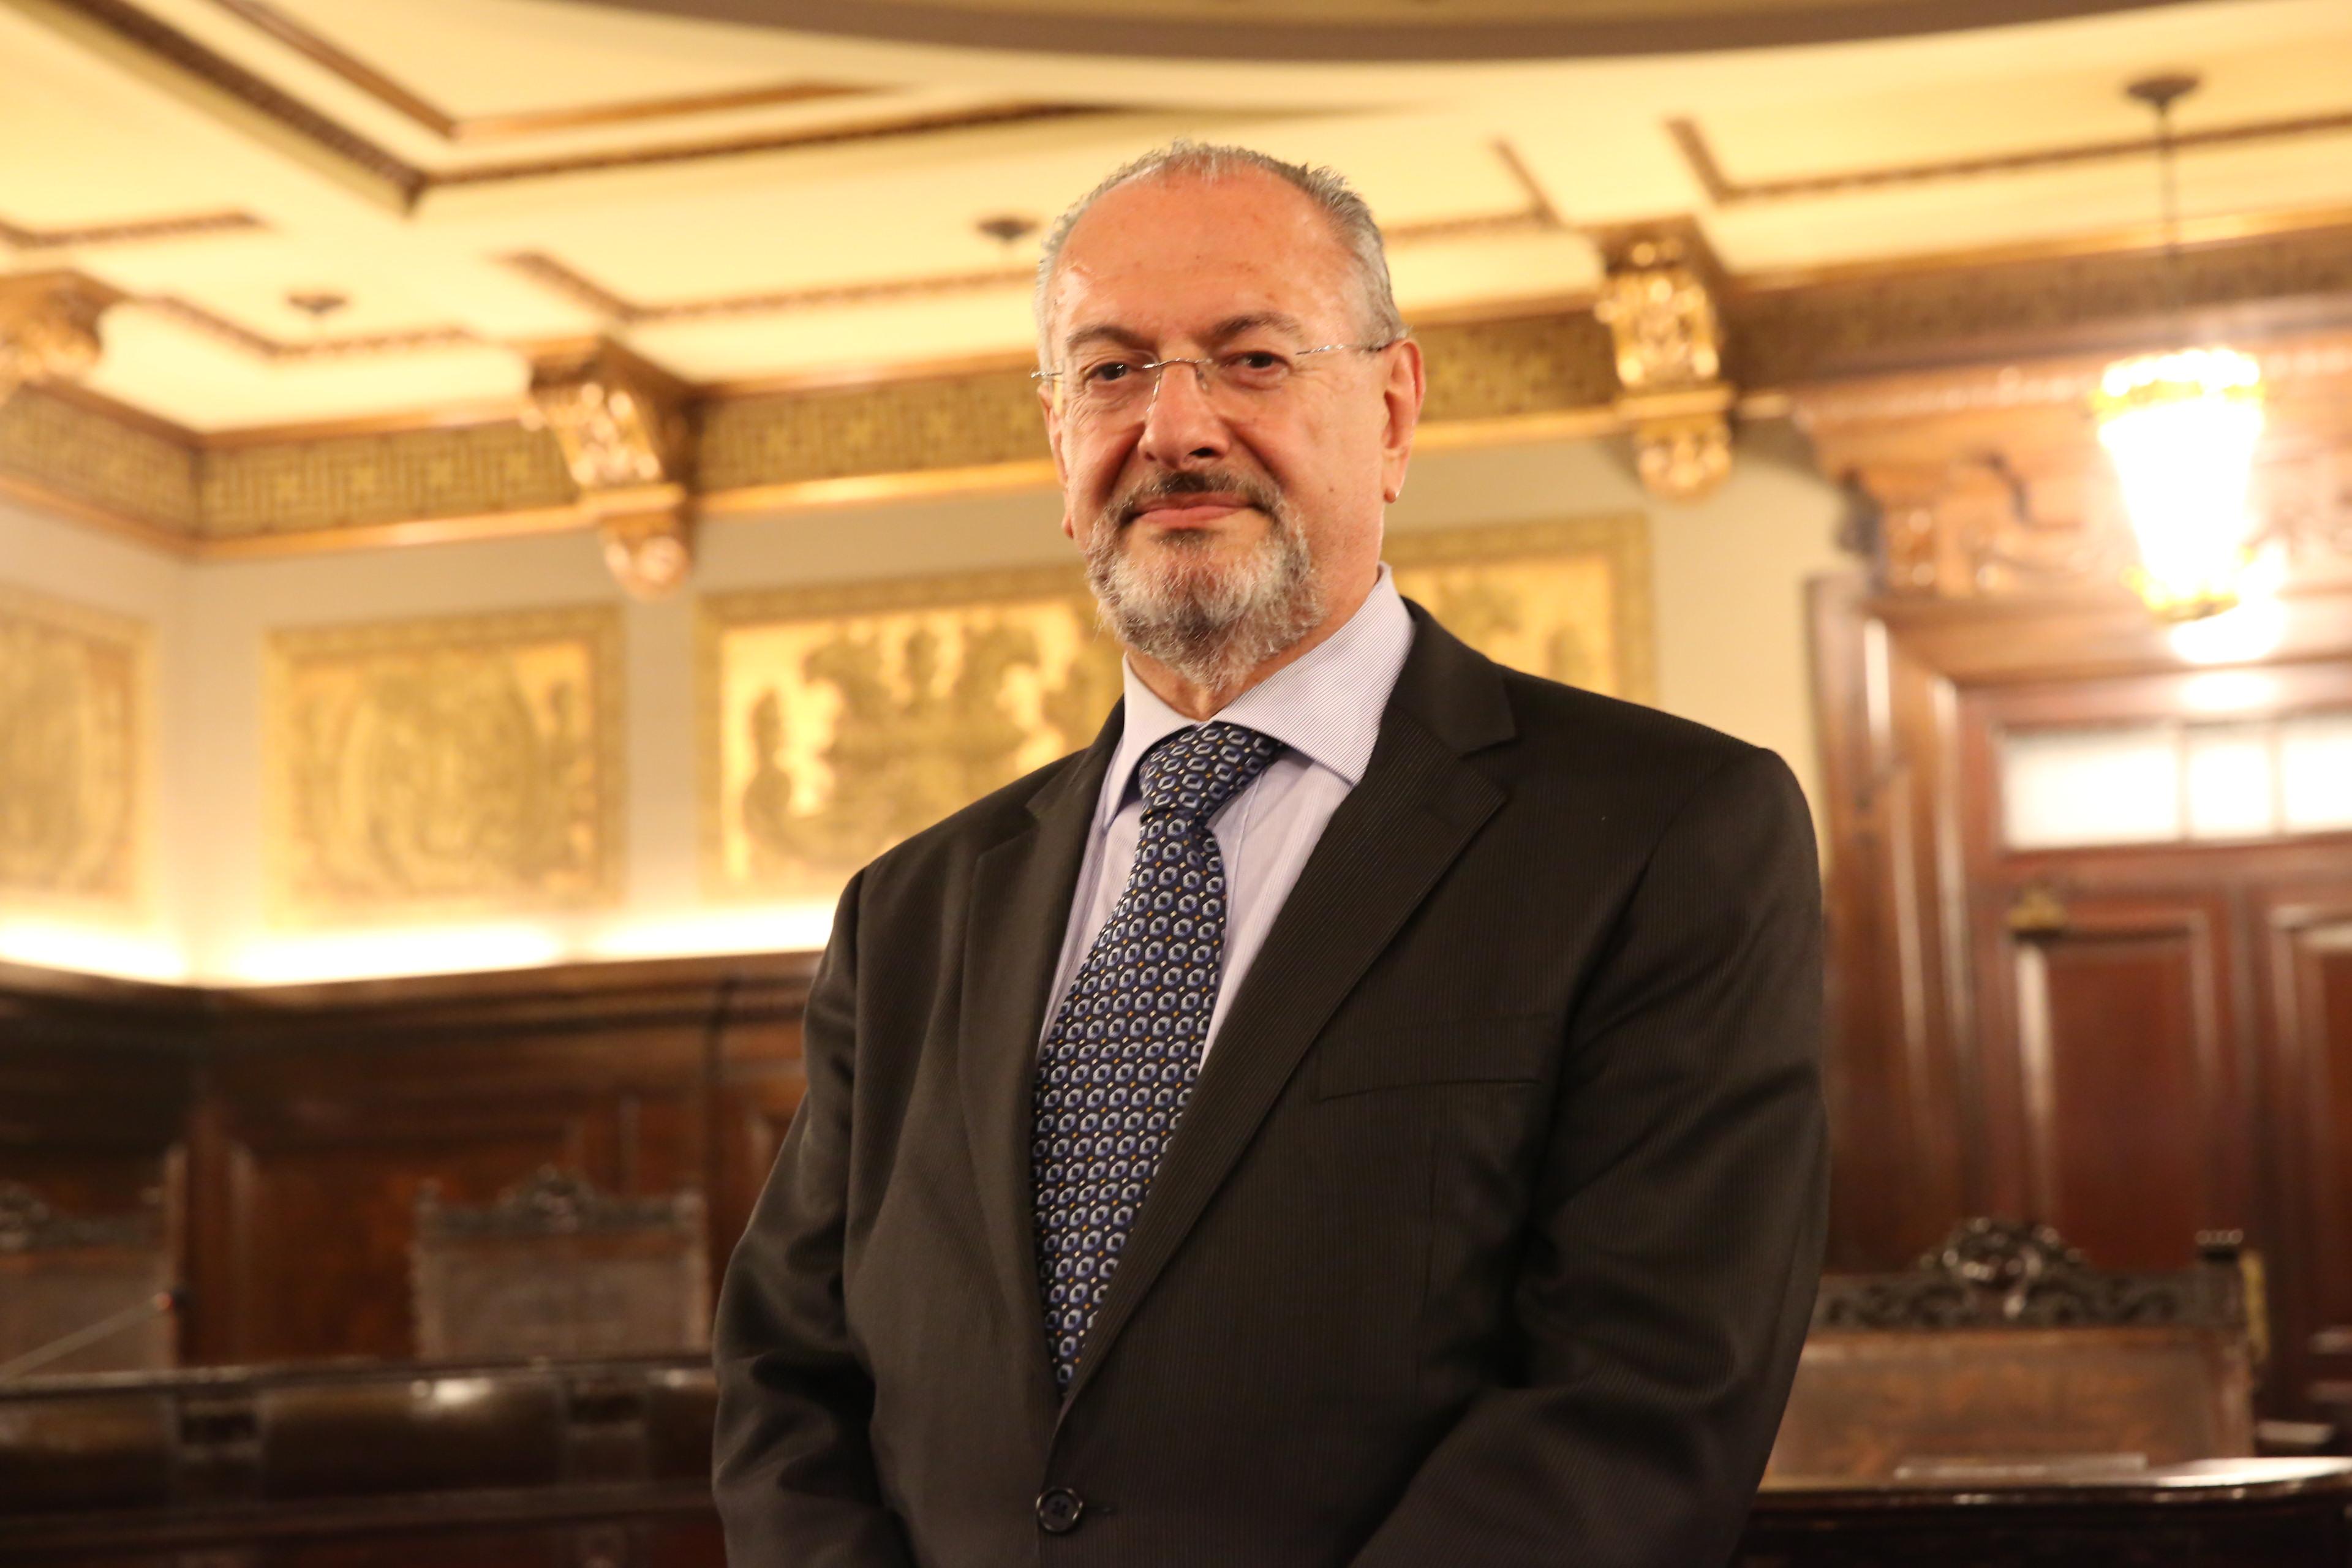 José Renato Nalini Ministrará Palestra Magna Do XII Encontro Notarial E Registral Do Rio Grande Do Sul